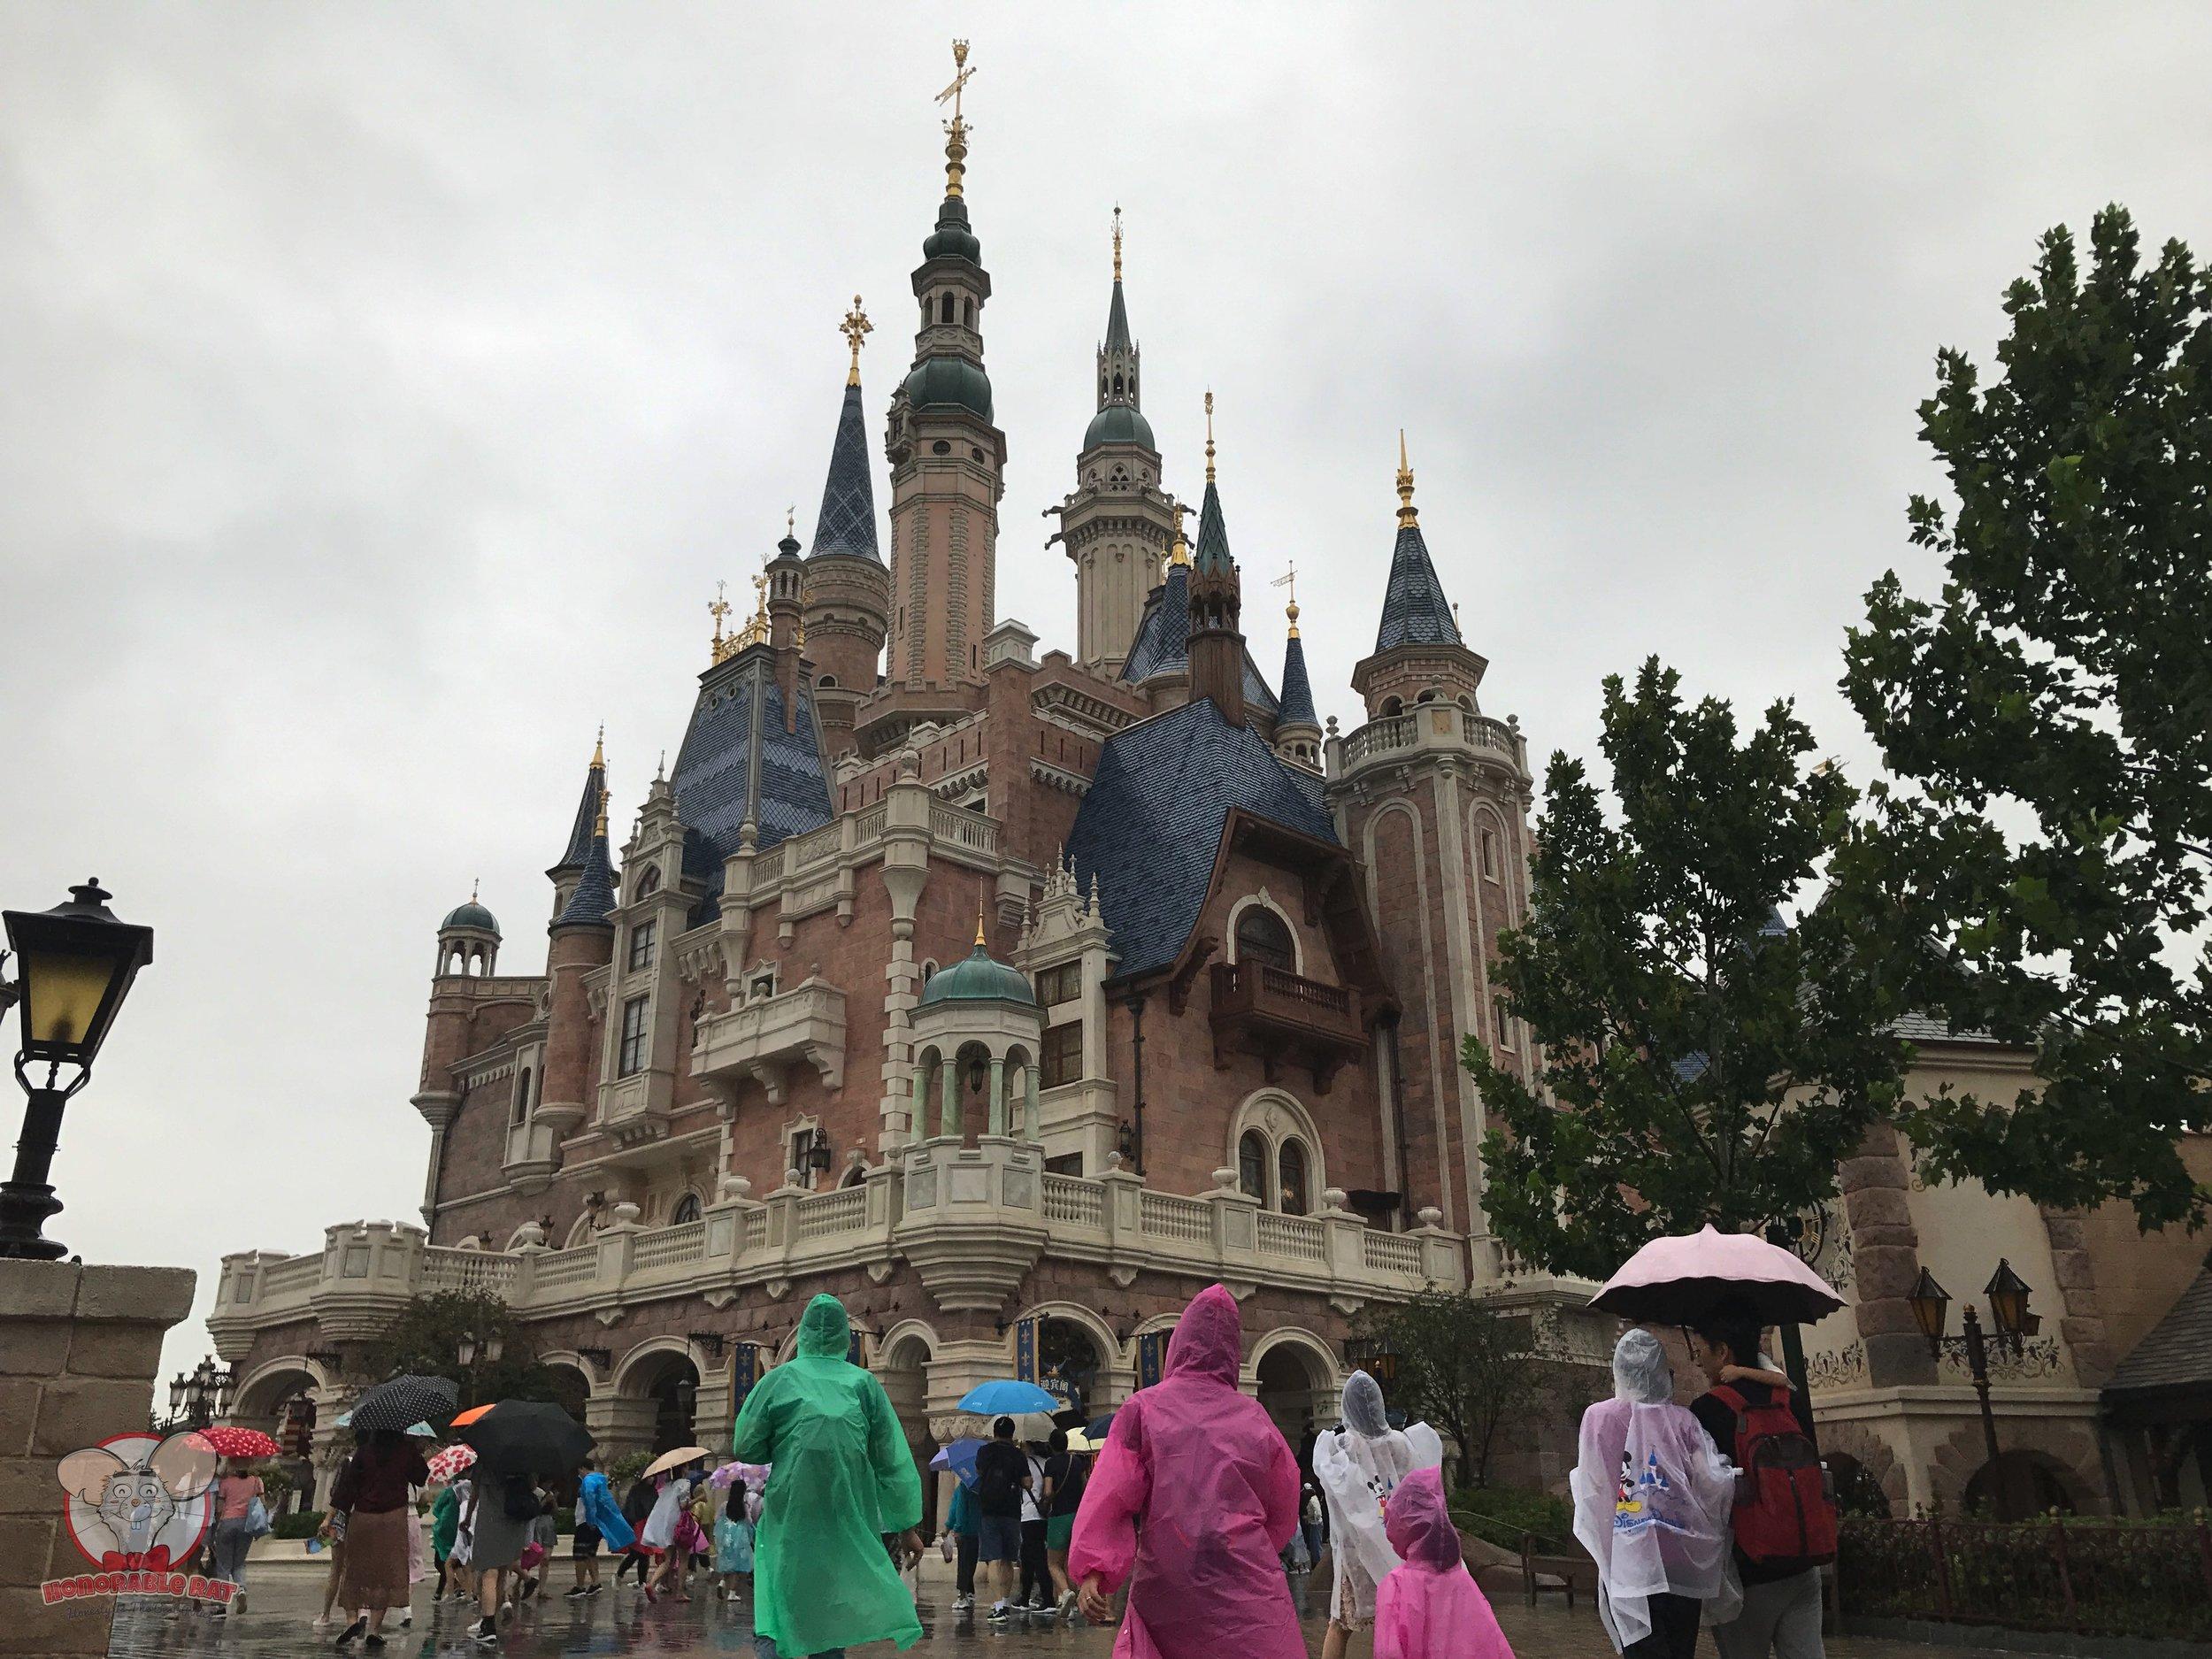 Rain rain go away, come again another day